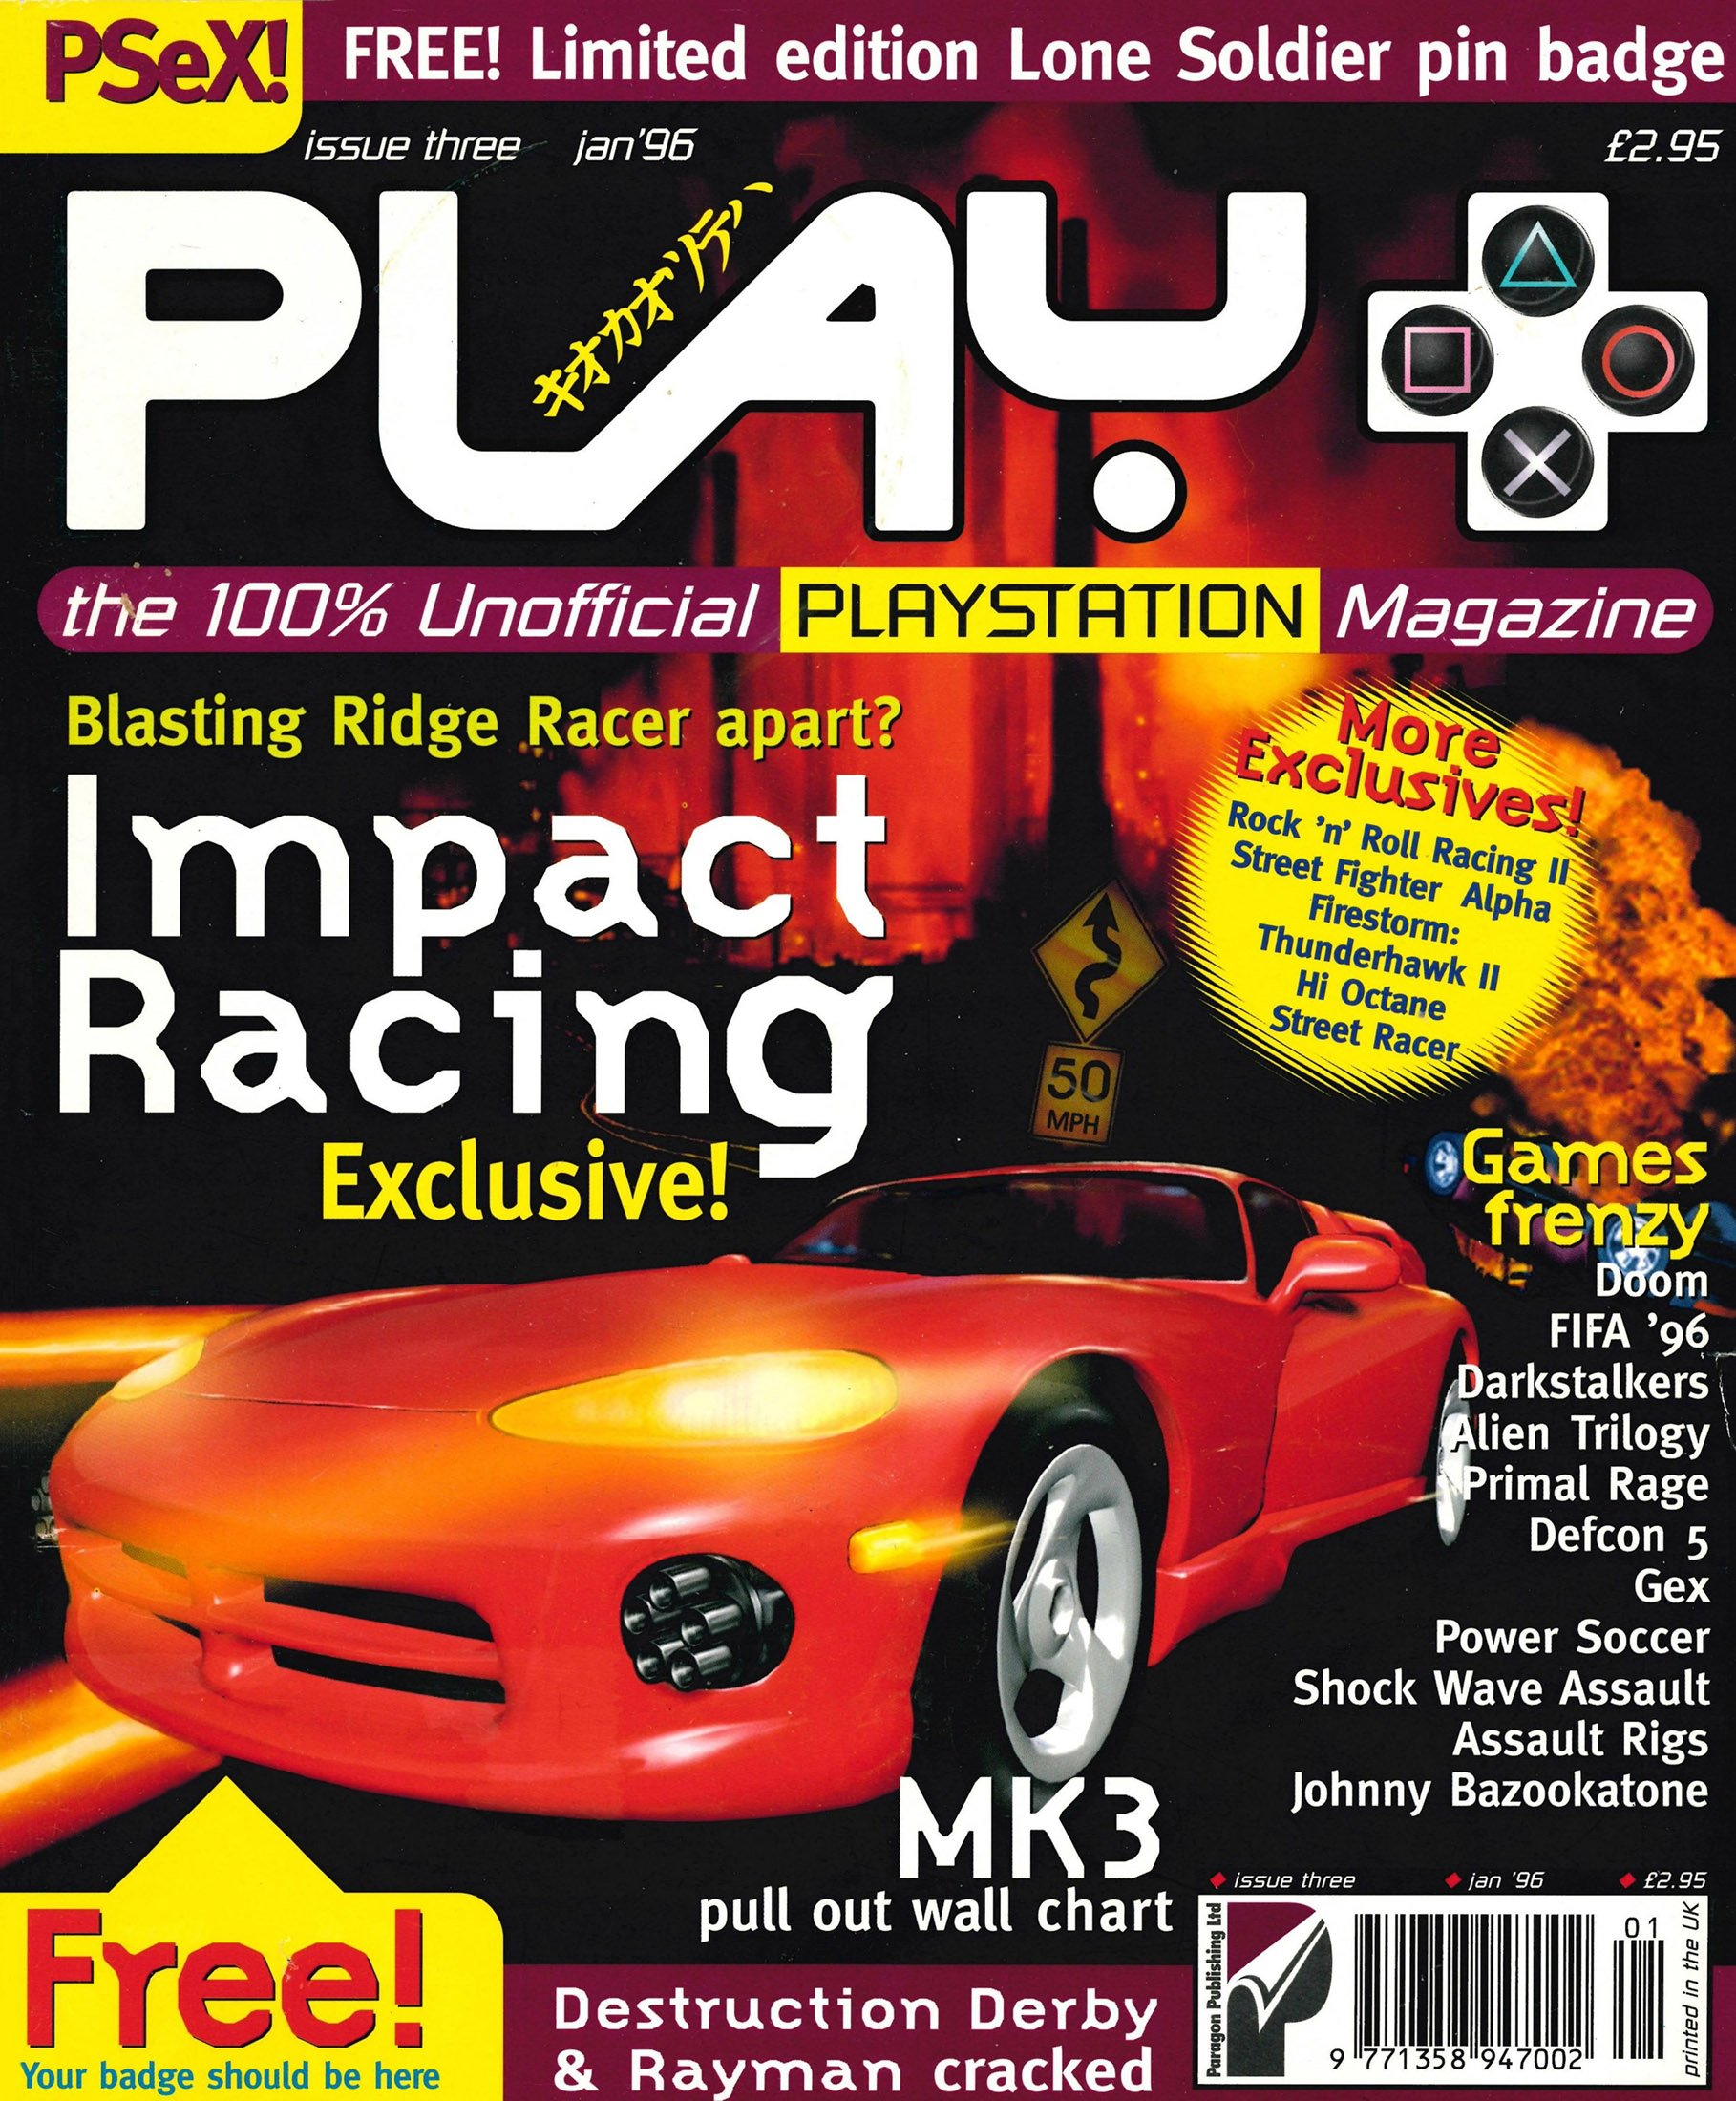 Play UK 003 (January 1996)